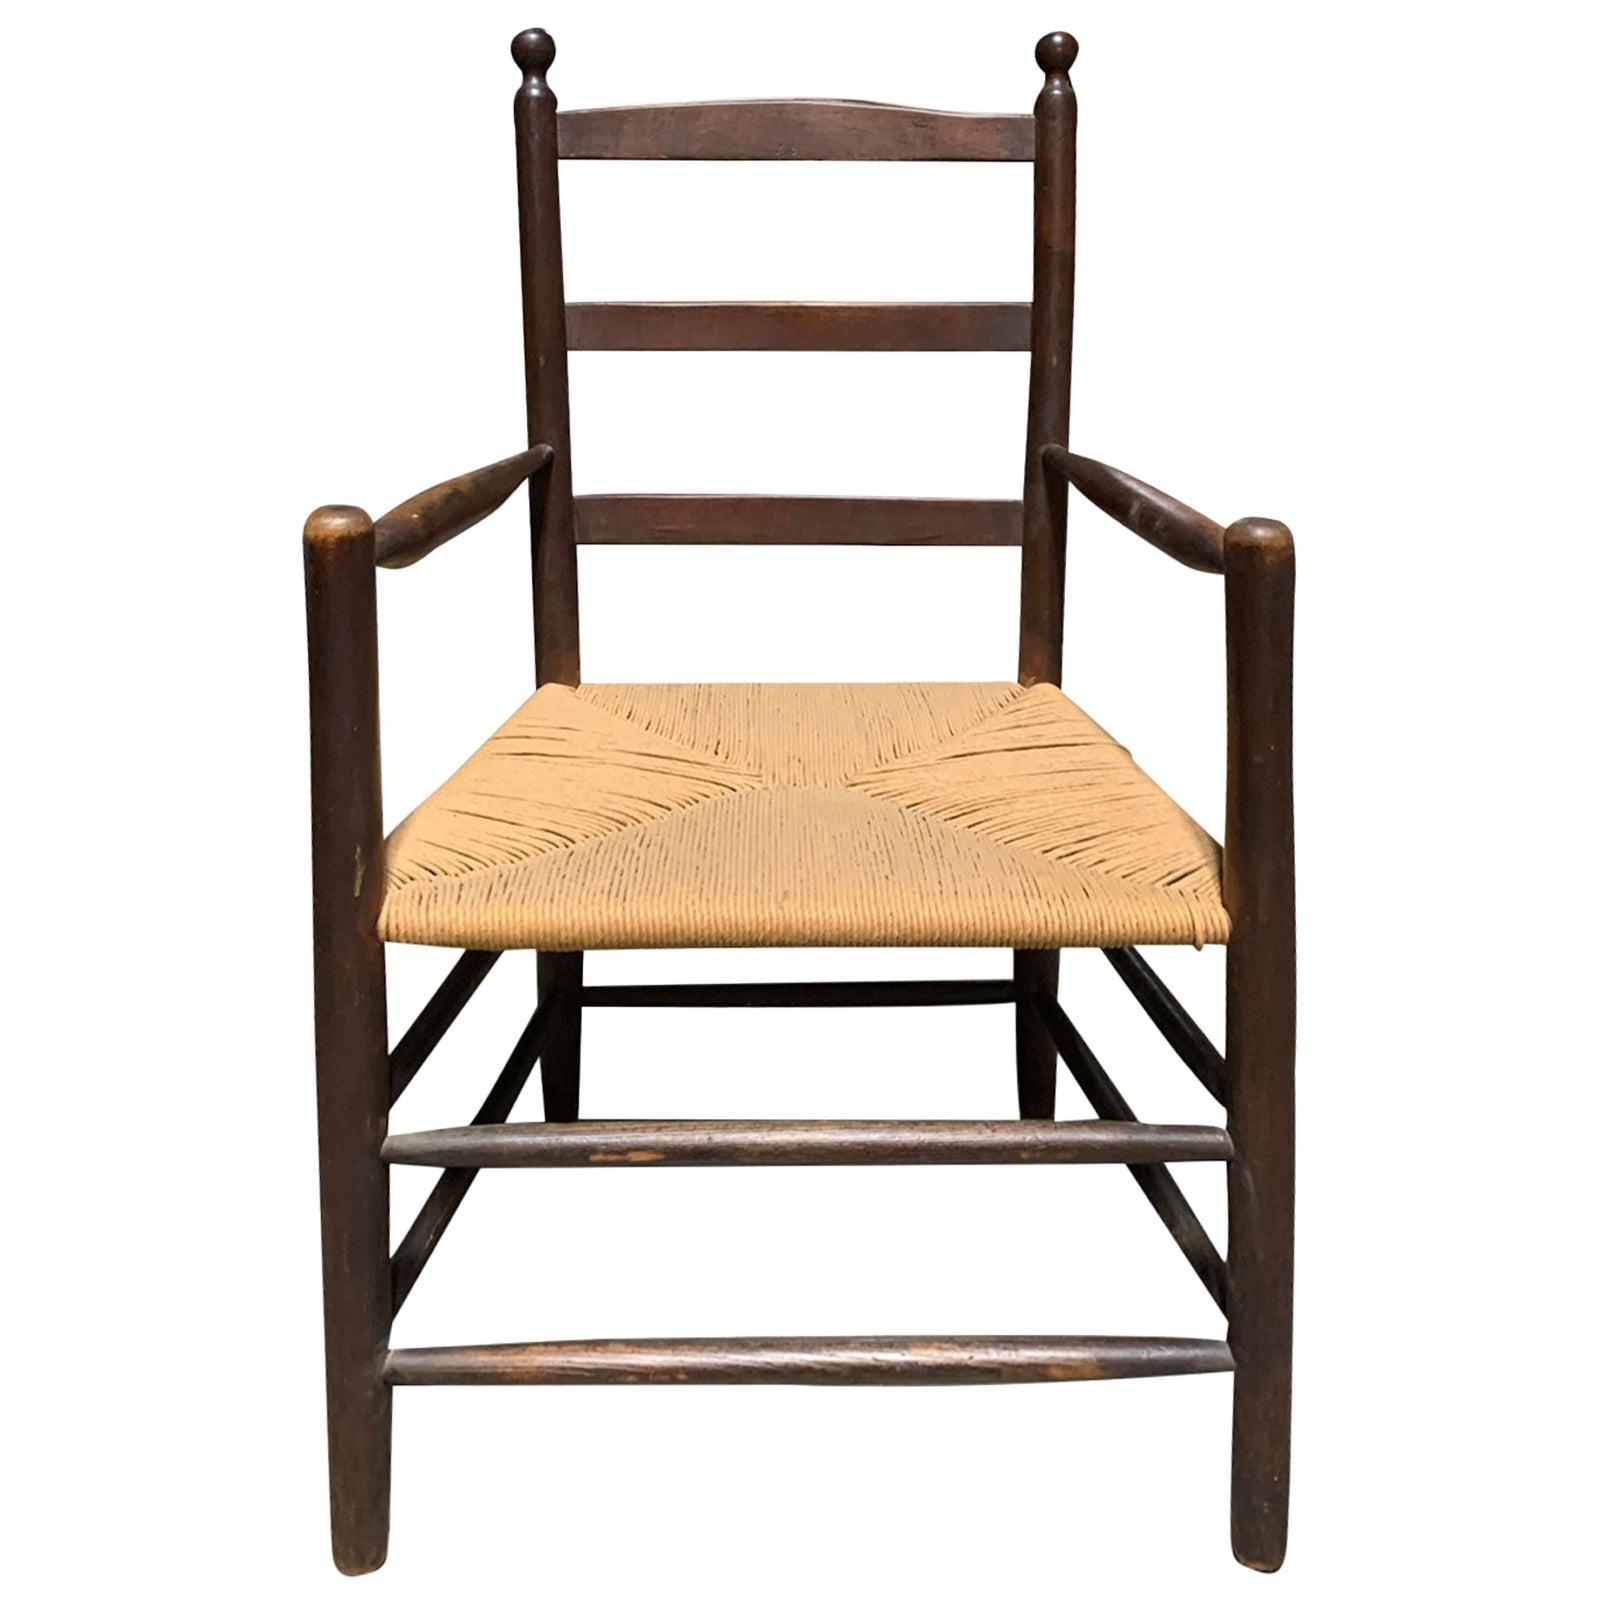 Primitive Armchair with Rush Seat, circa 1900